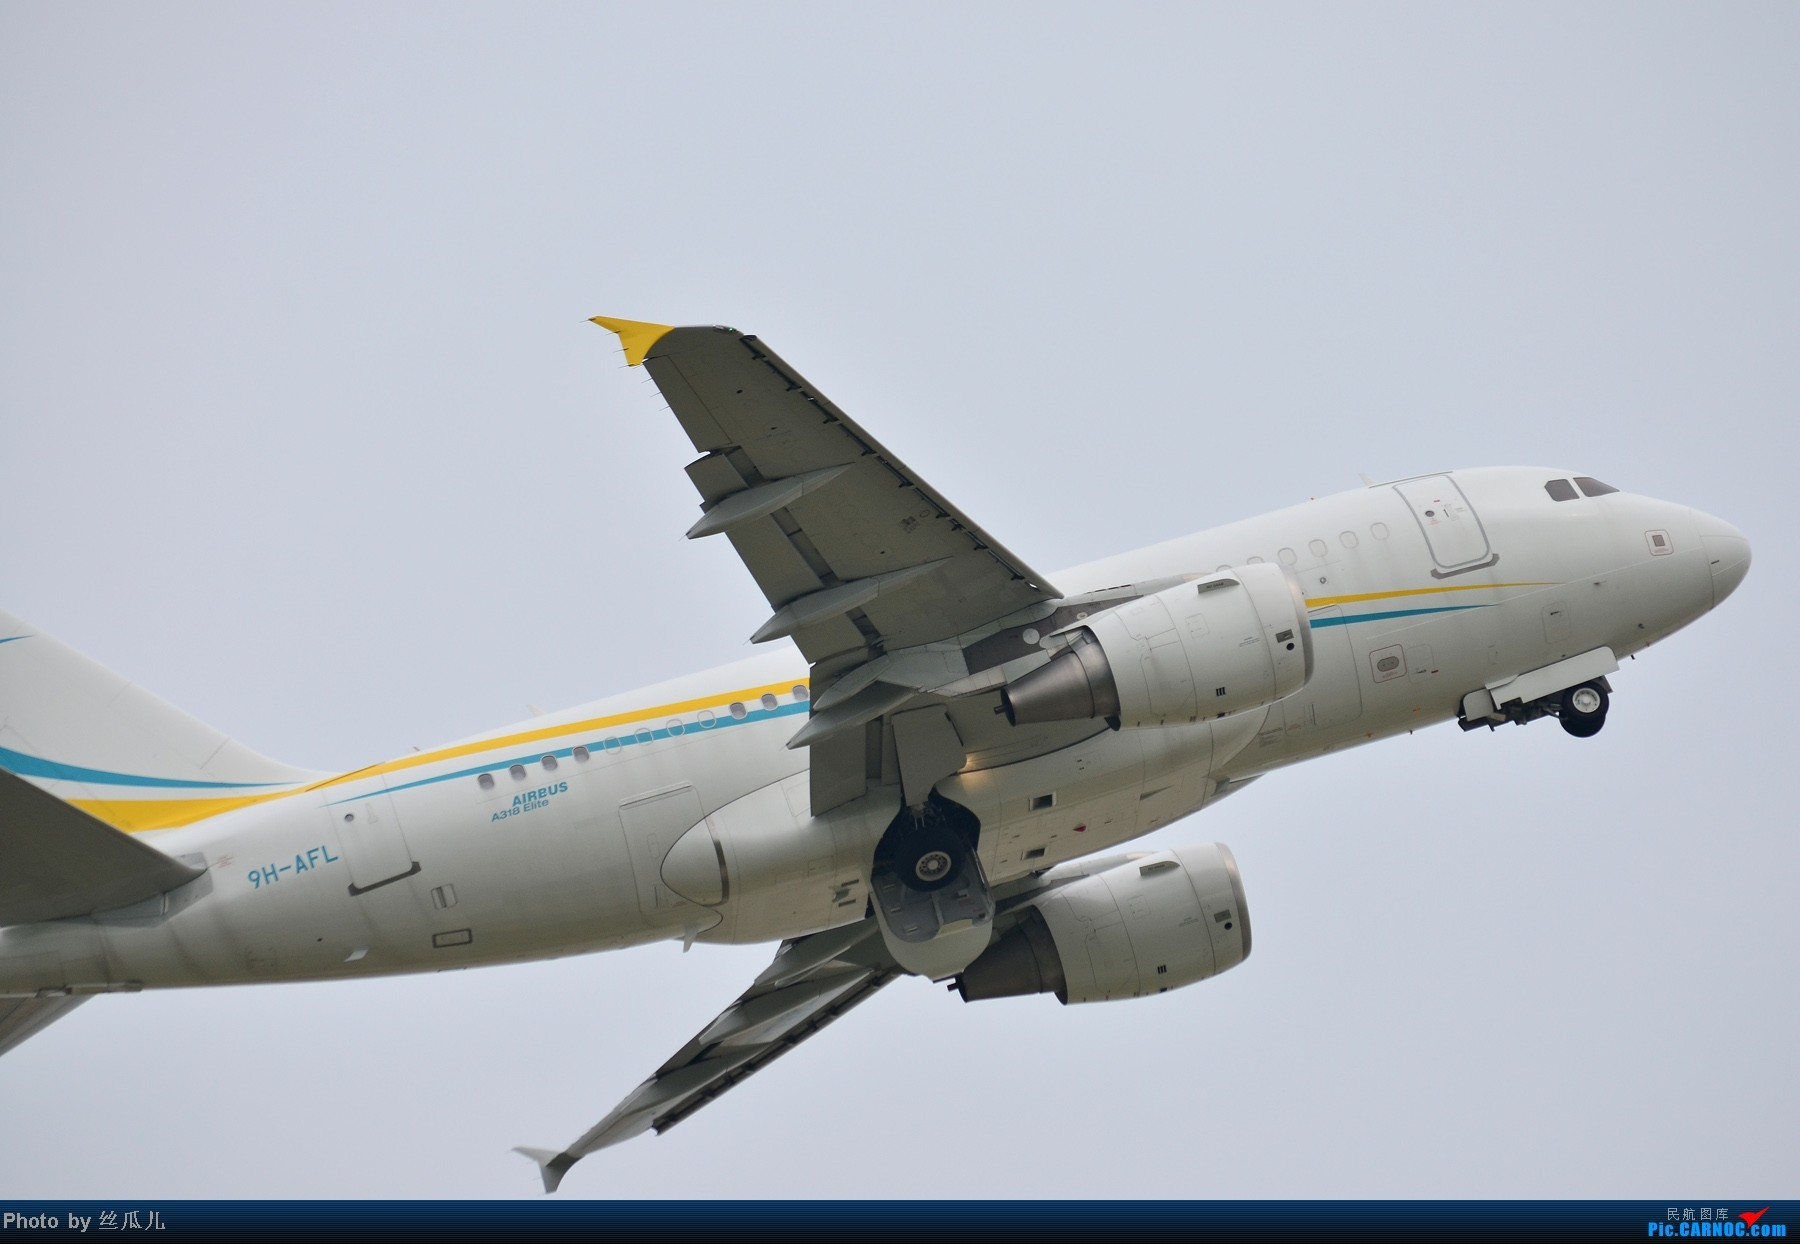 Re:[原创]这货是谁家的??????????????????????????? AIRBUS A318 9H-AFL 中国杭州萧山机场